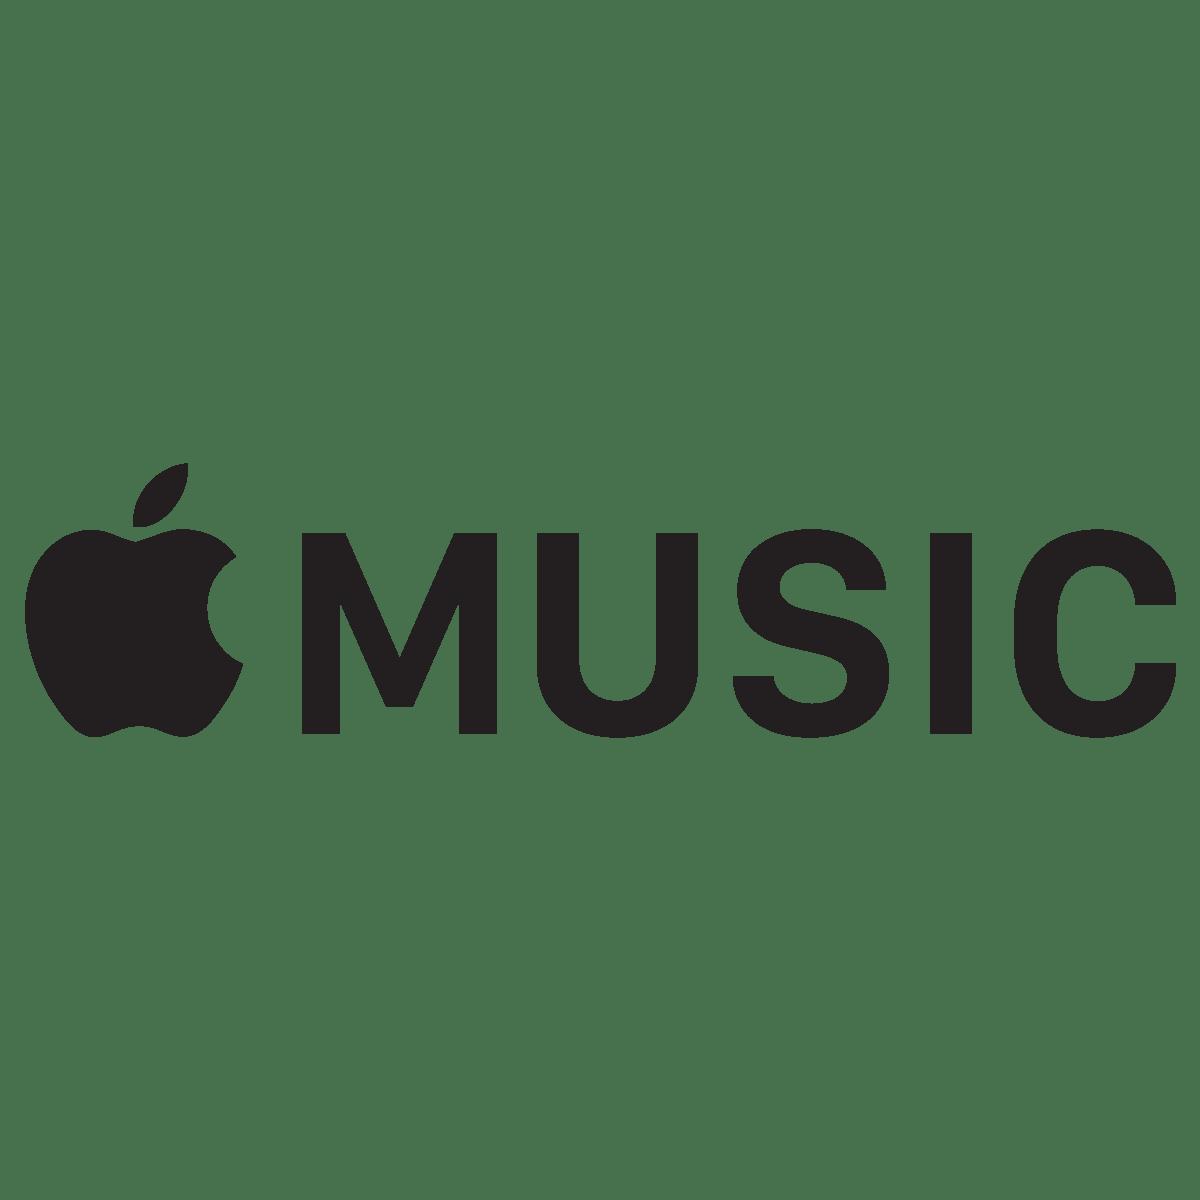 Apple Music Content Creation Office Set For Nashville's ...